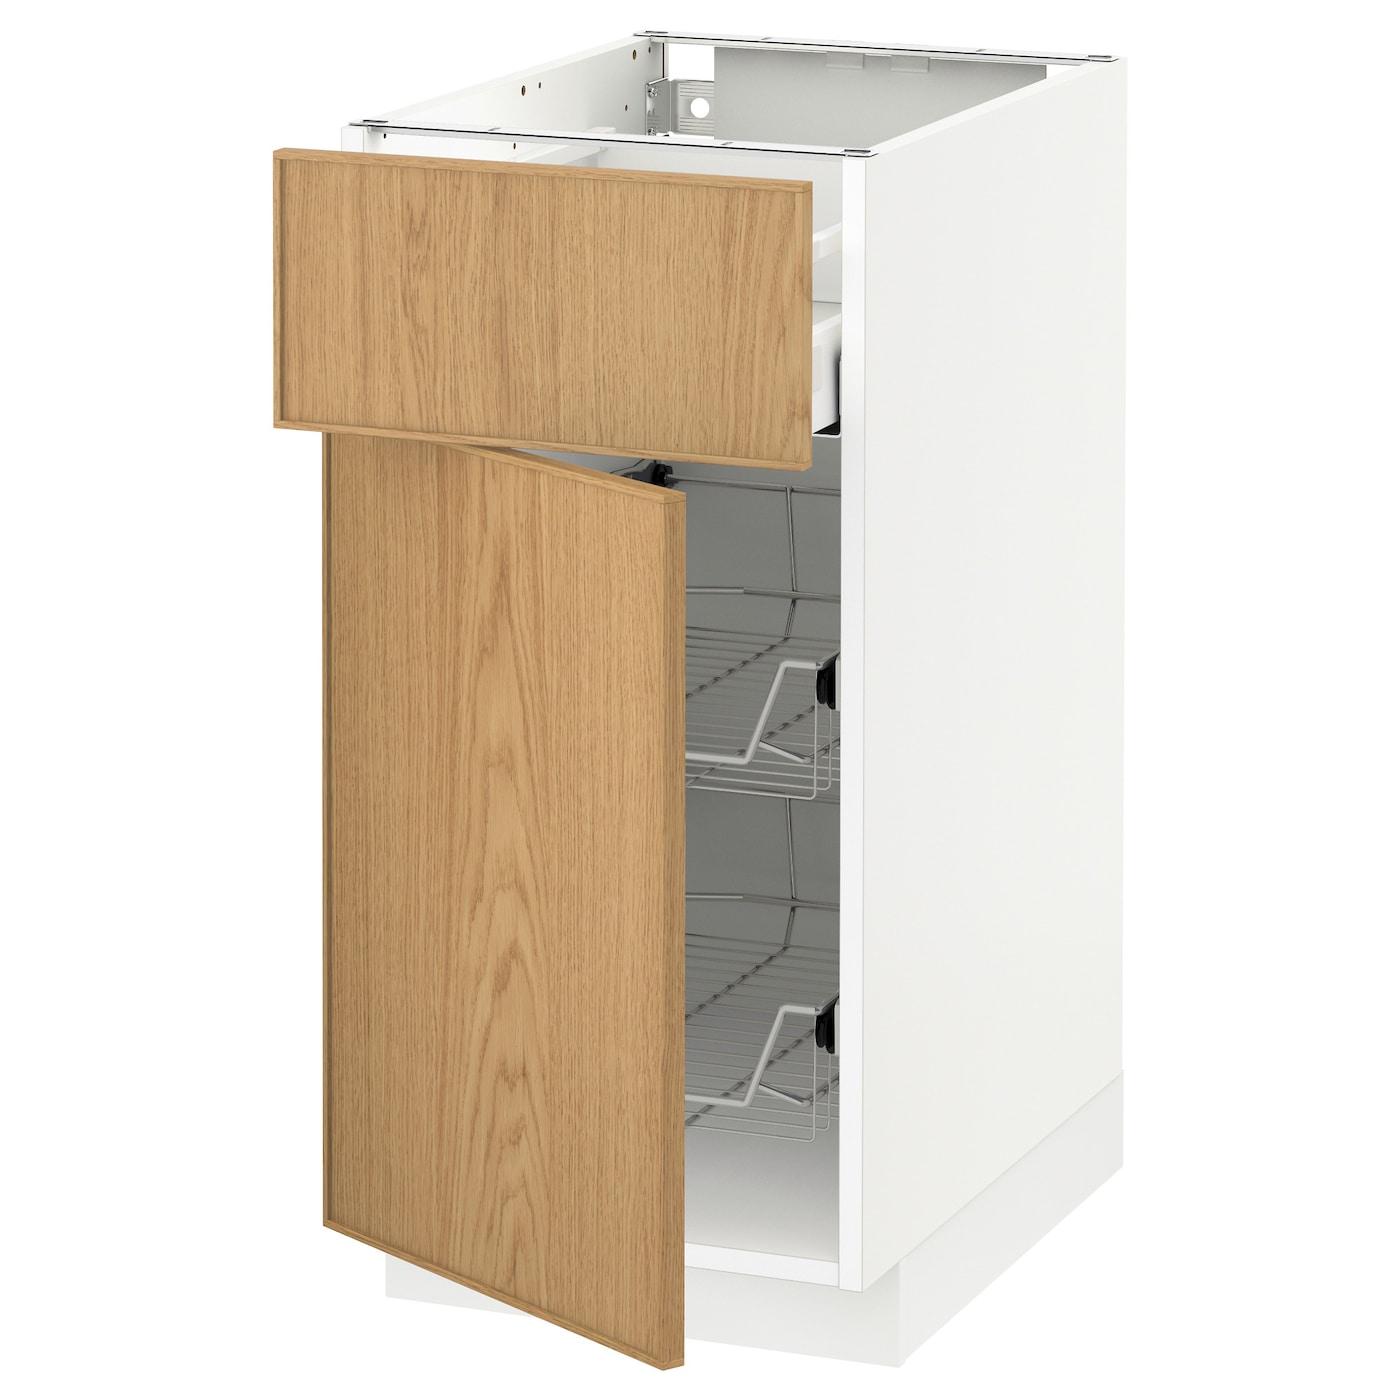 METOD / MAXIMERA | Bad | Weiß | IKEA